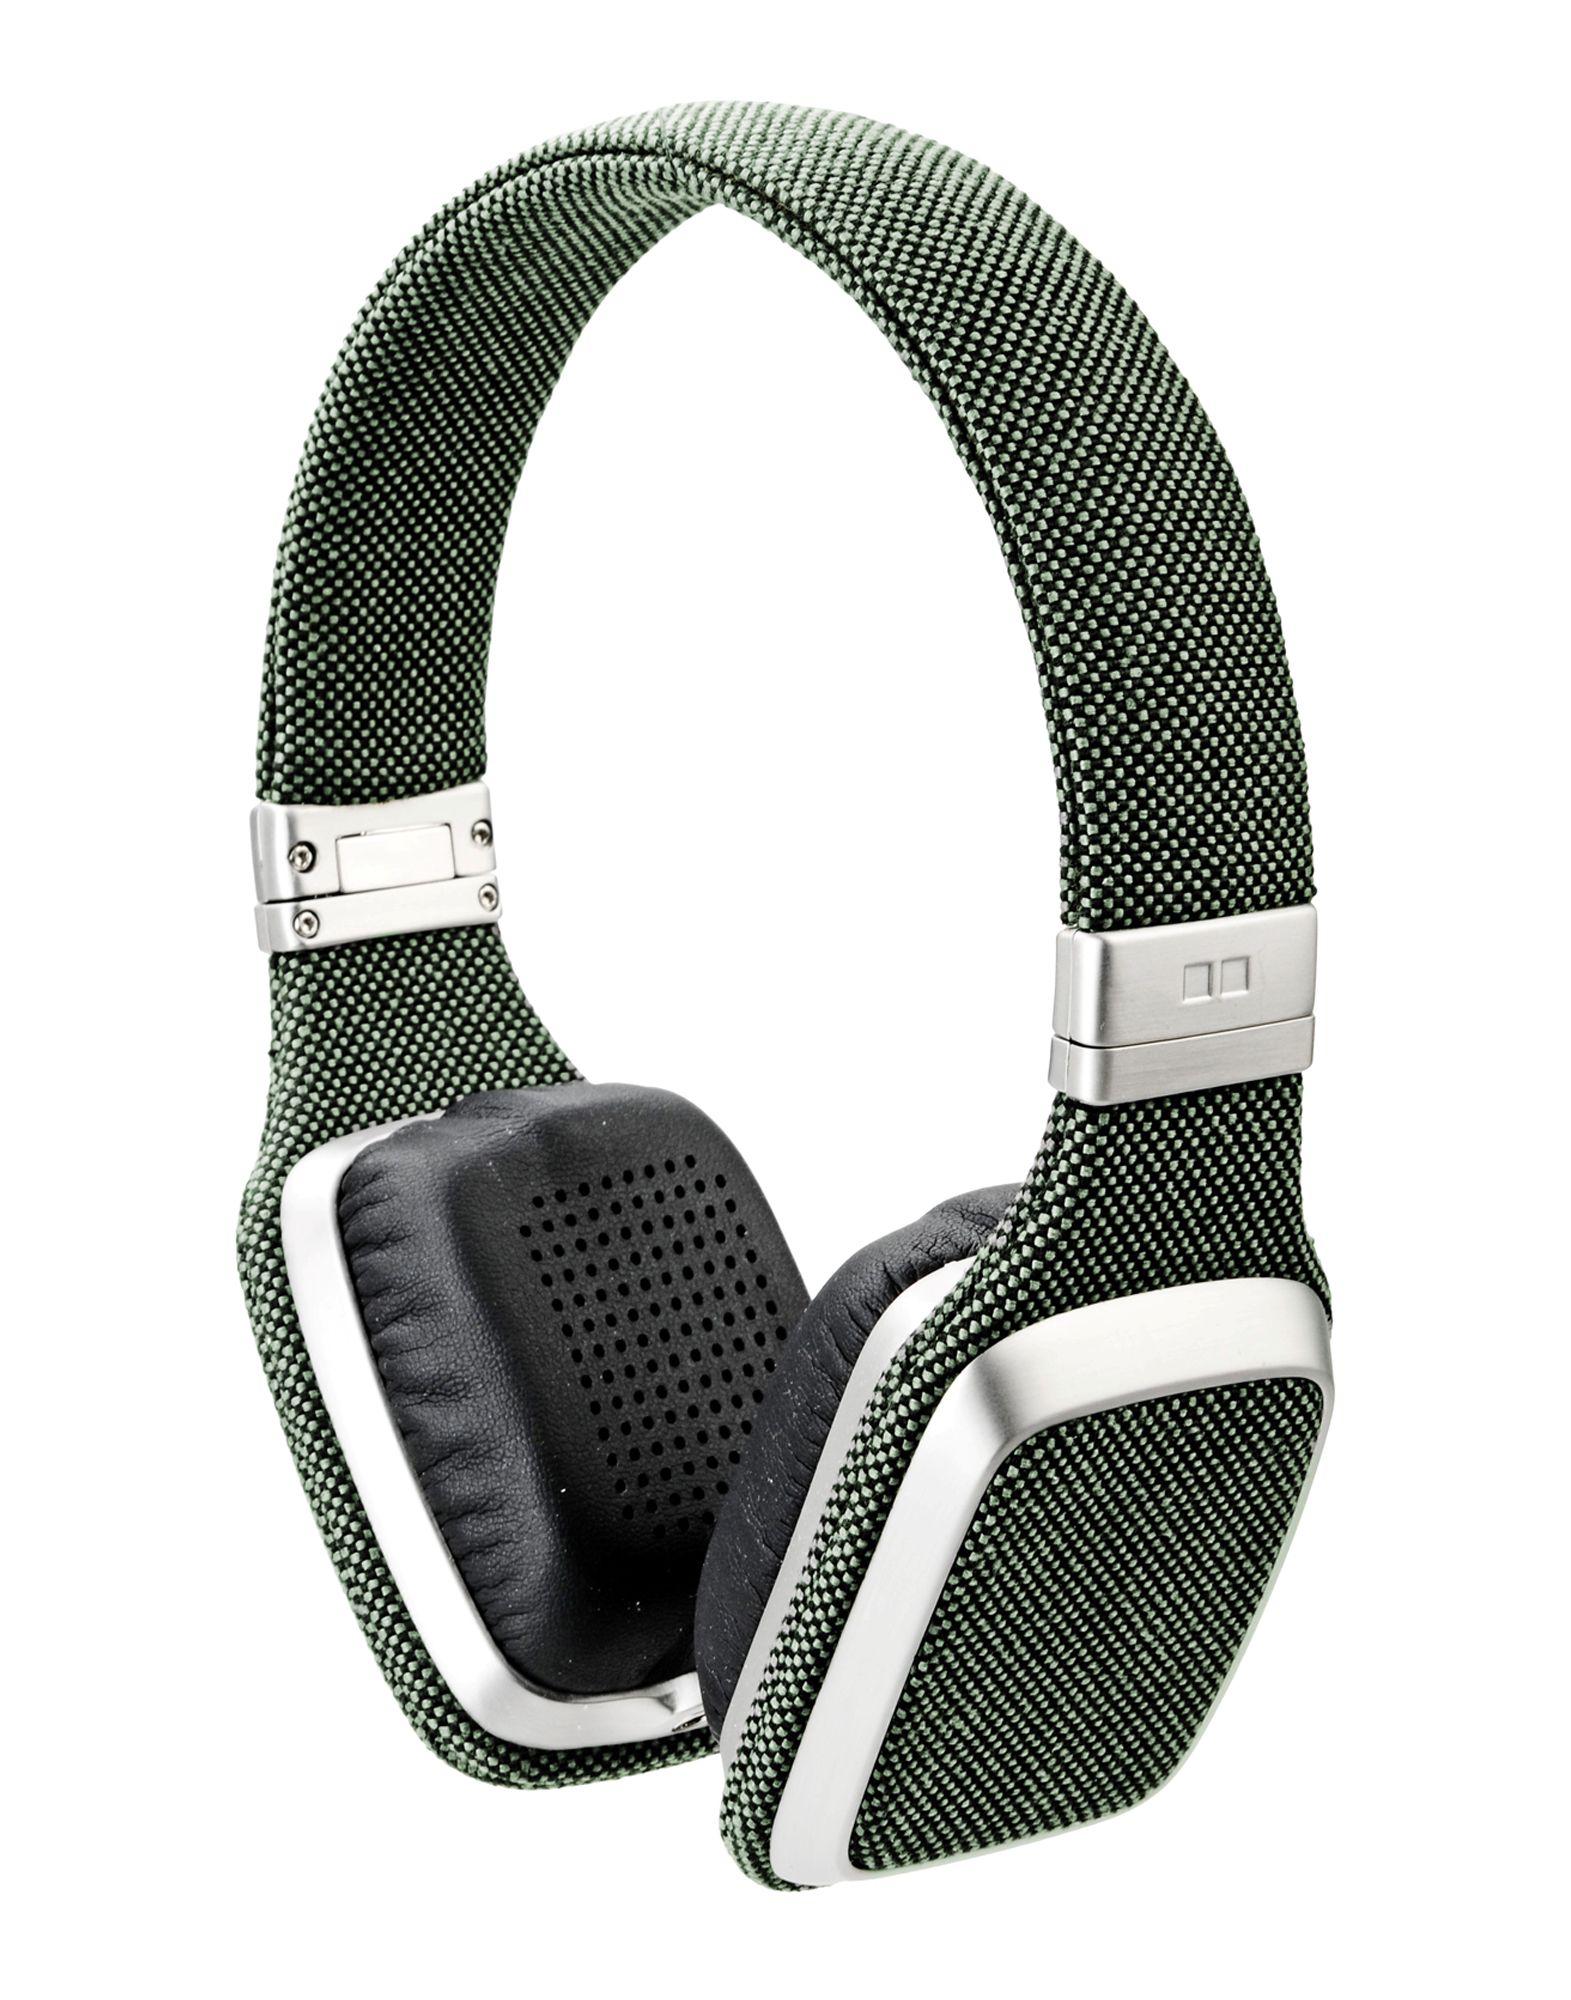 ORA ÏTO Ora ïto Ora ïto Ora ïto Headphones